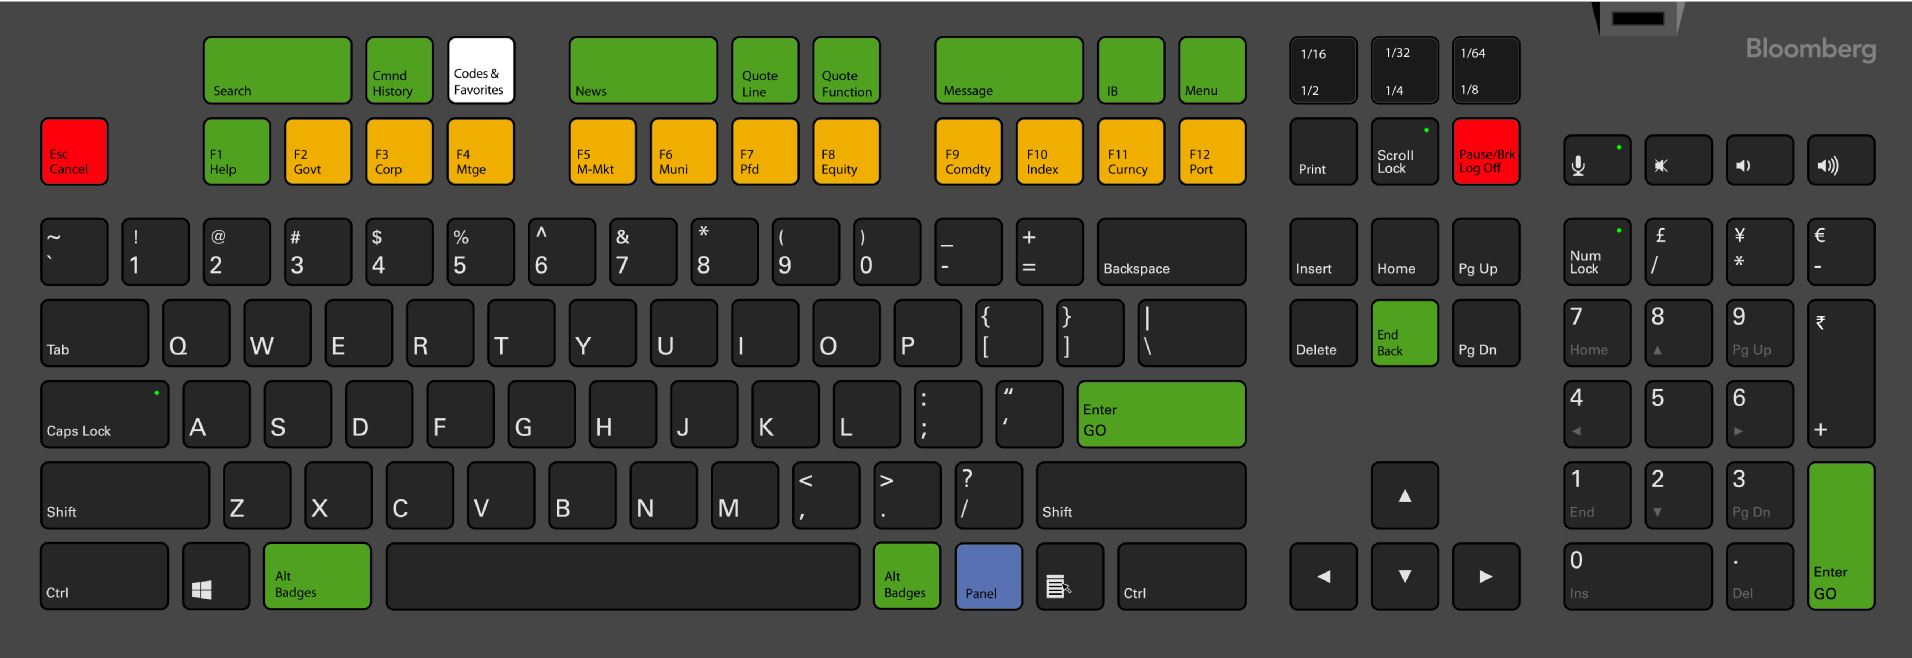 Bloomberg keyboard image